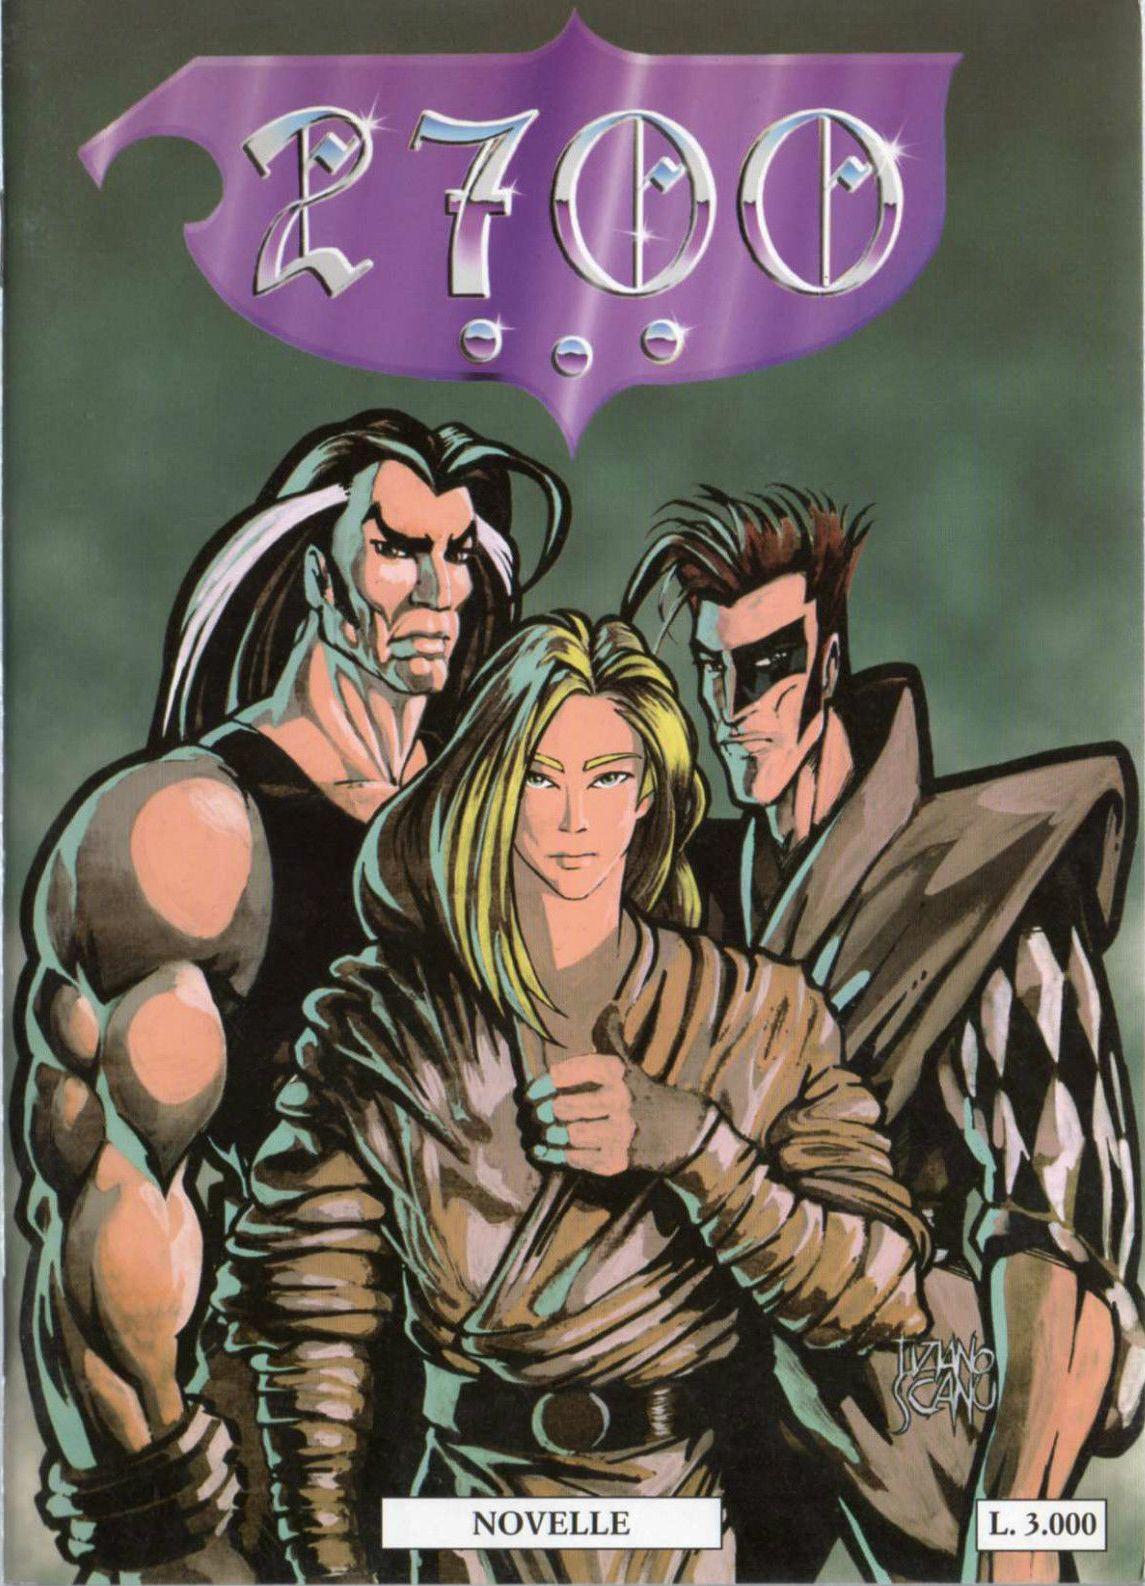 2700: Novelle Vol 1 1